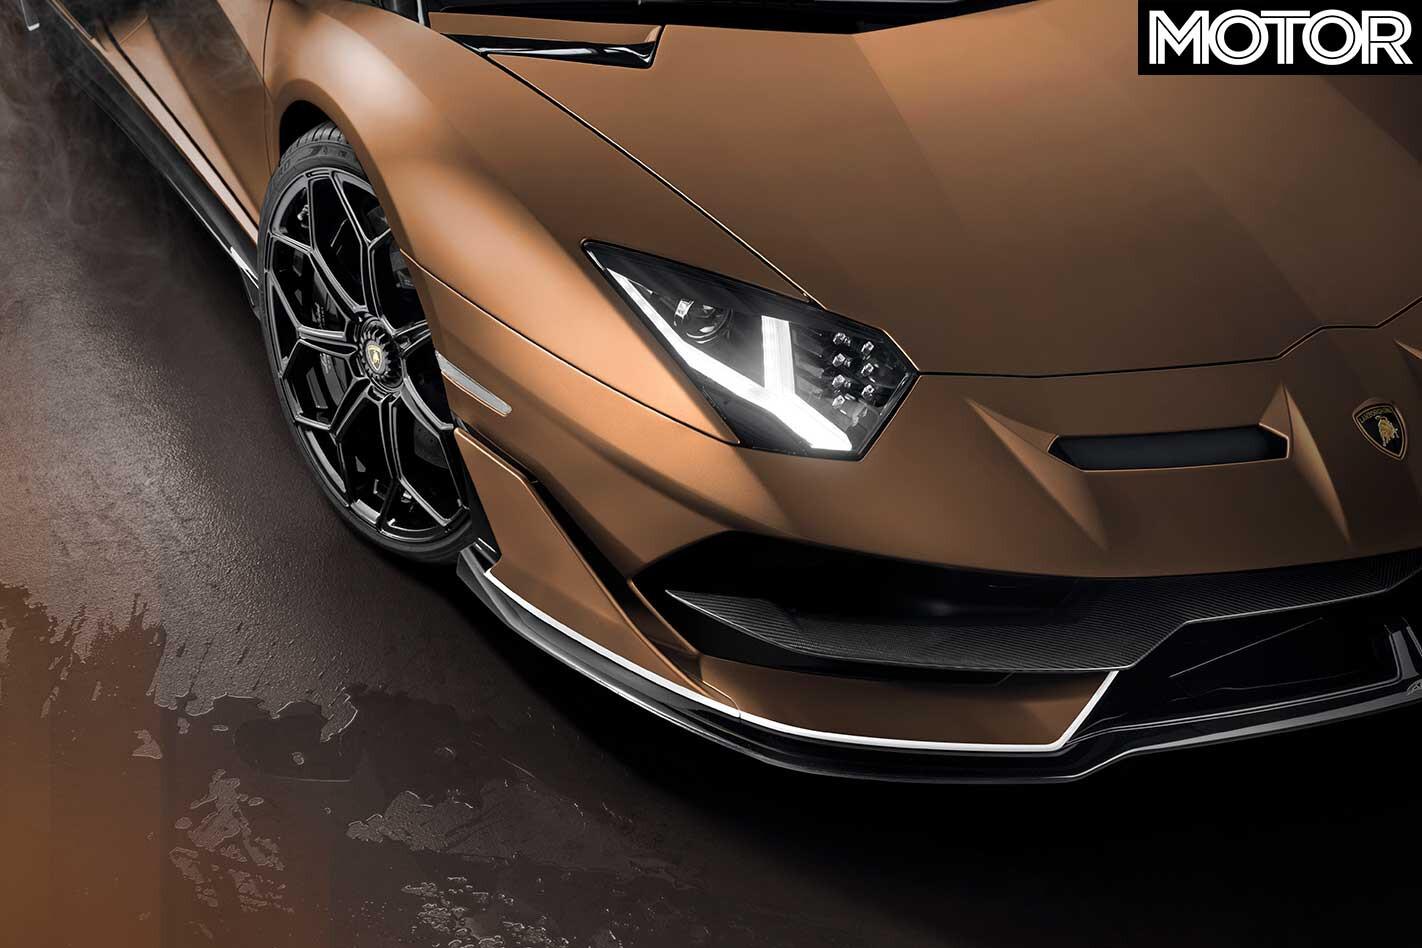 2019 Geneva Motor Show Lamborghini Aventador SVJ Roadster Headlight Jpg